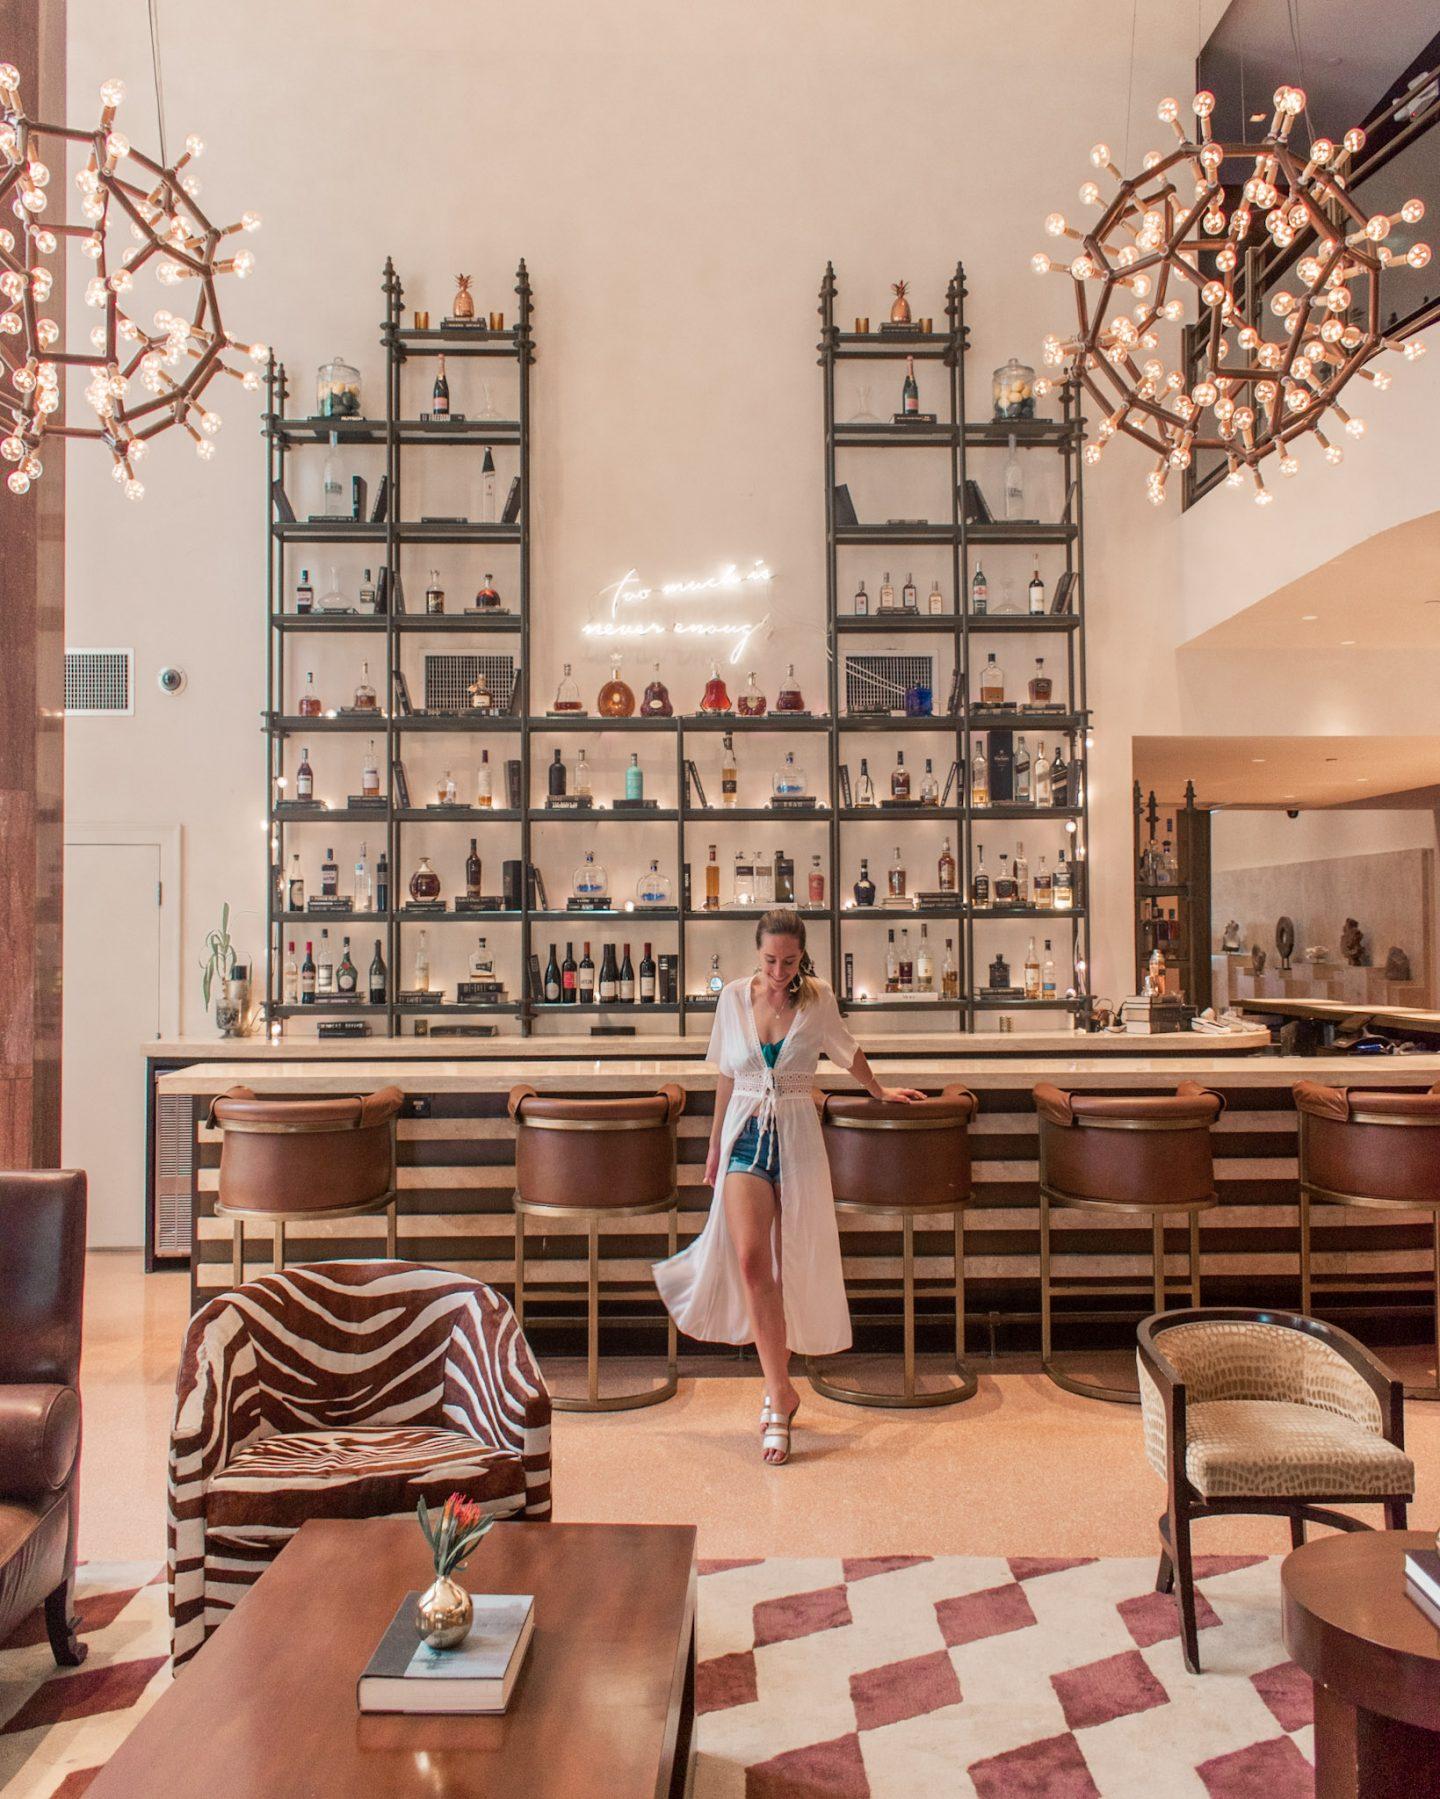 Shelborne miami hotel lobby bar